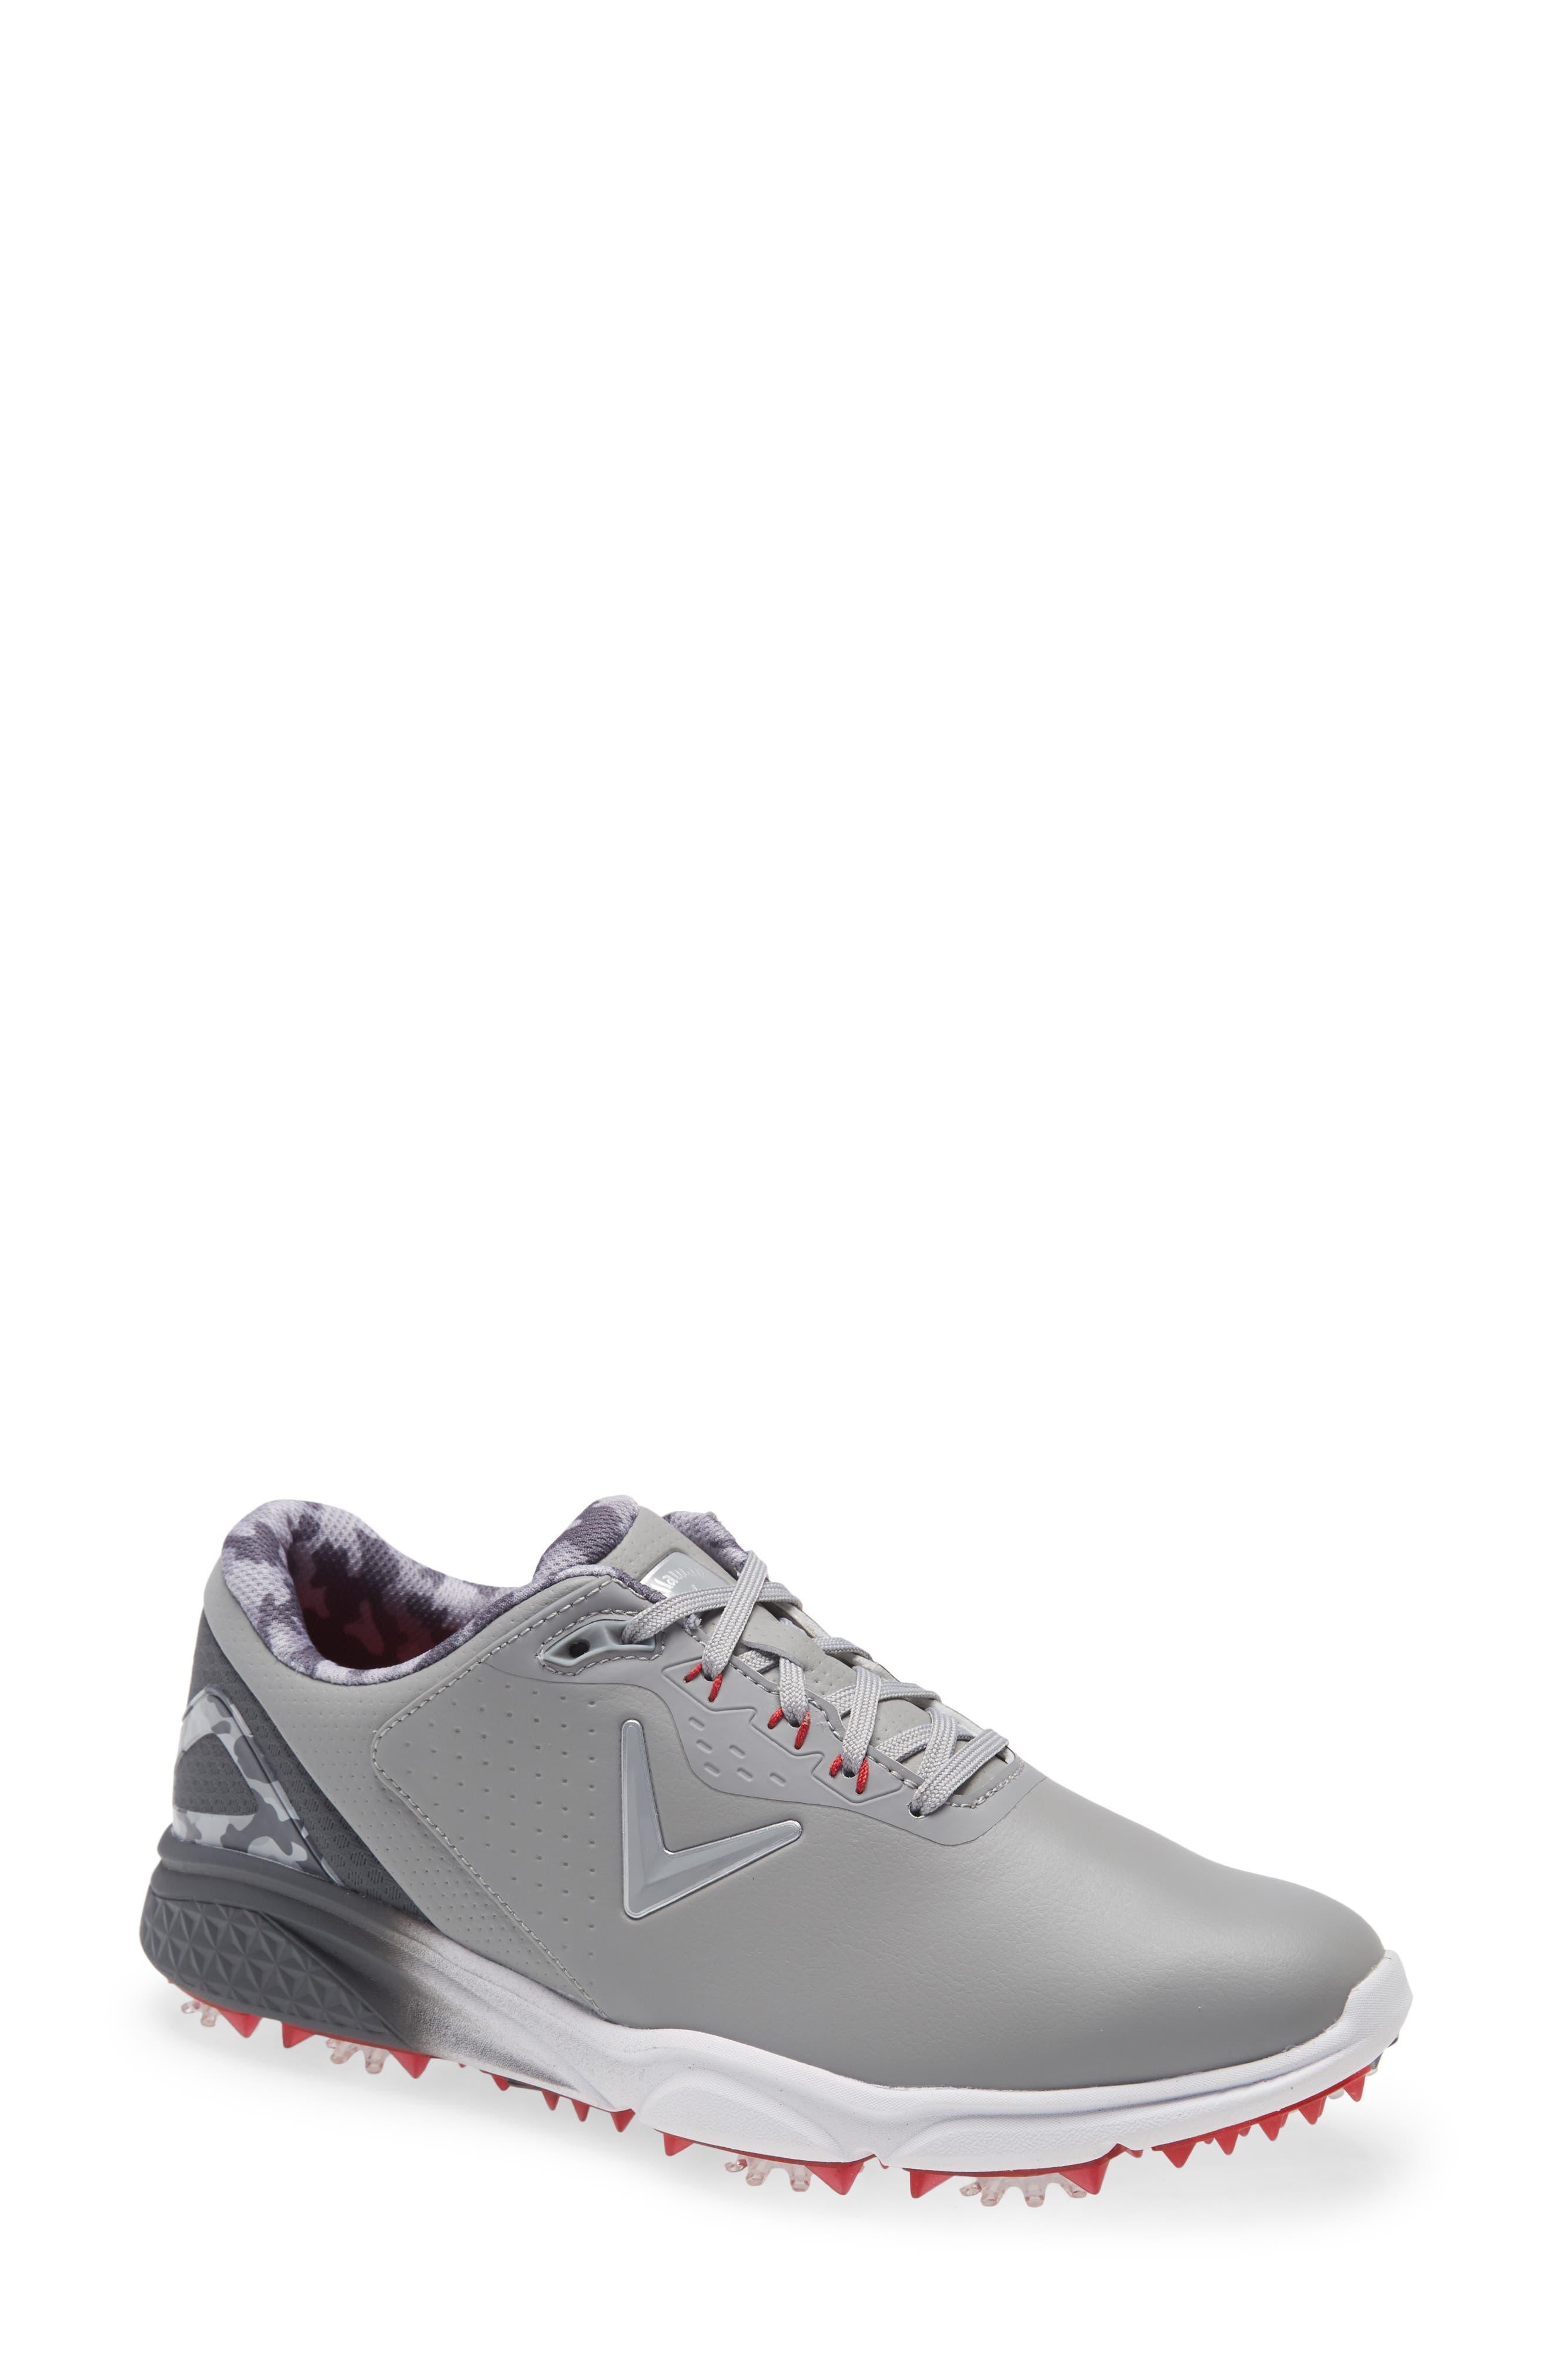 Men's Callaway Golf Coronado V2 Waterproof Golf Sneaker